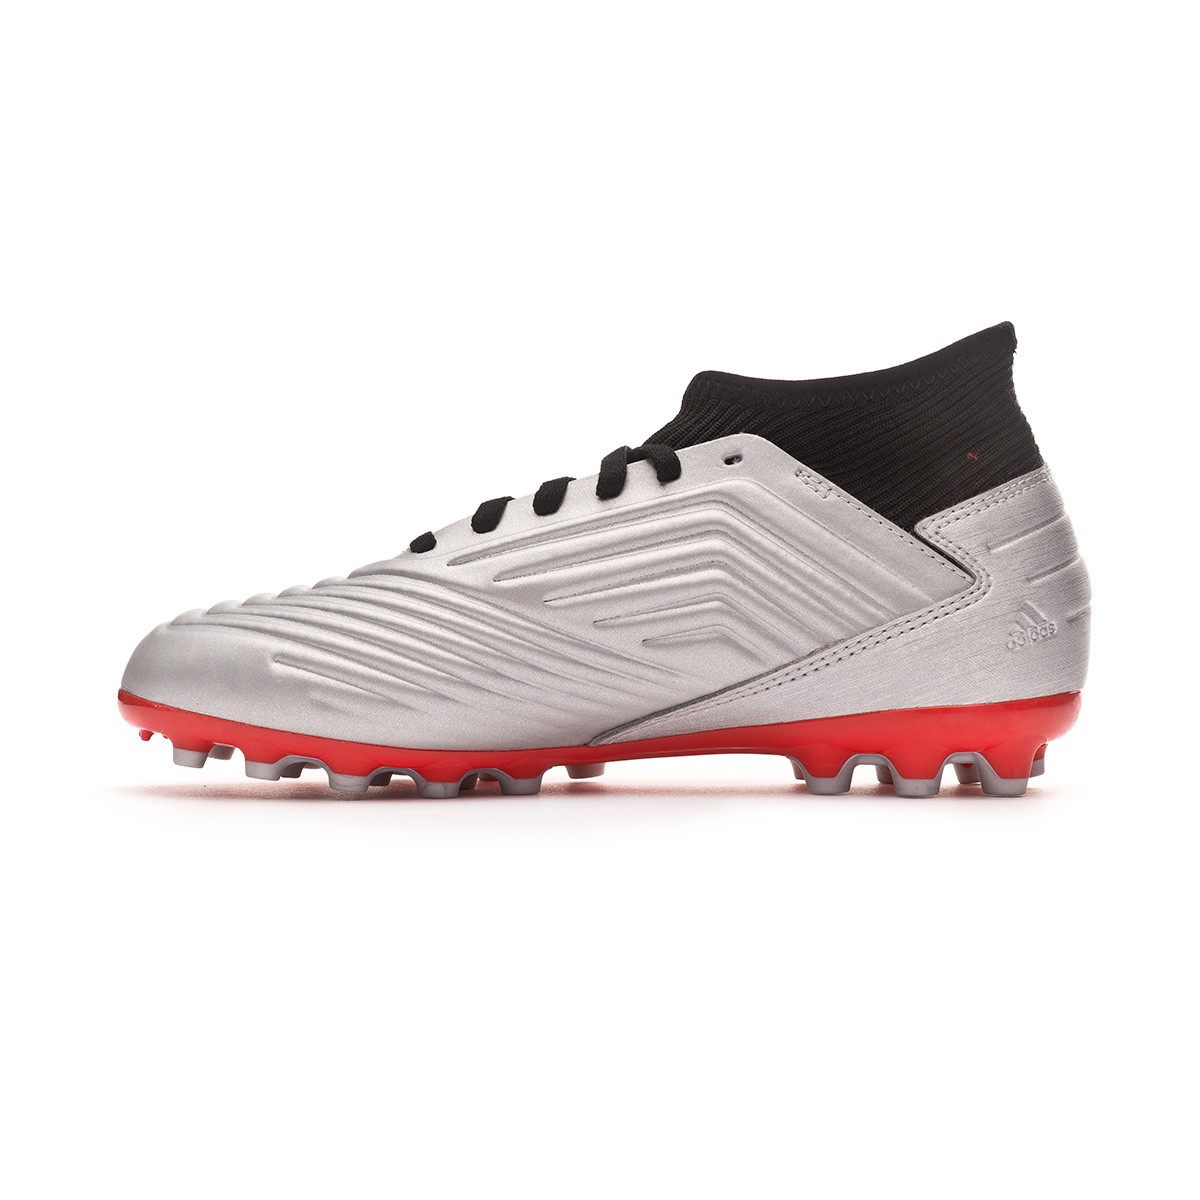 Chaussure de foot adidas Predator 19.3 AG enfant